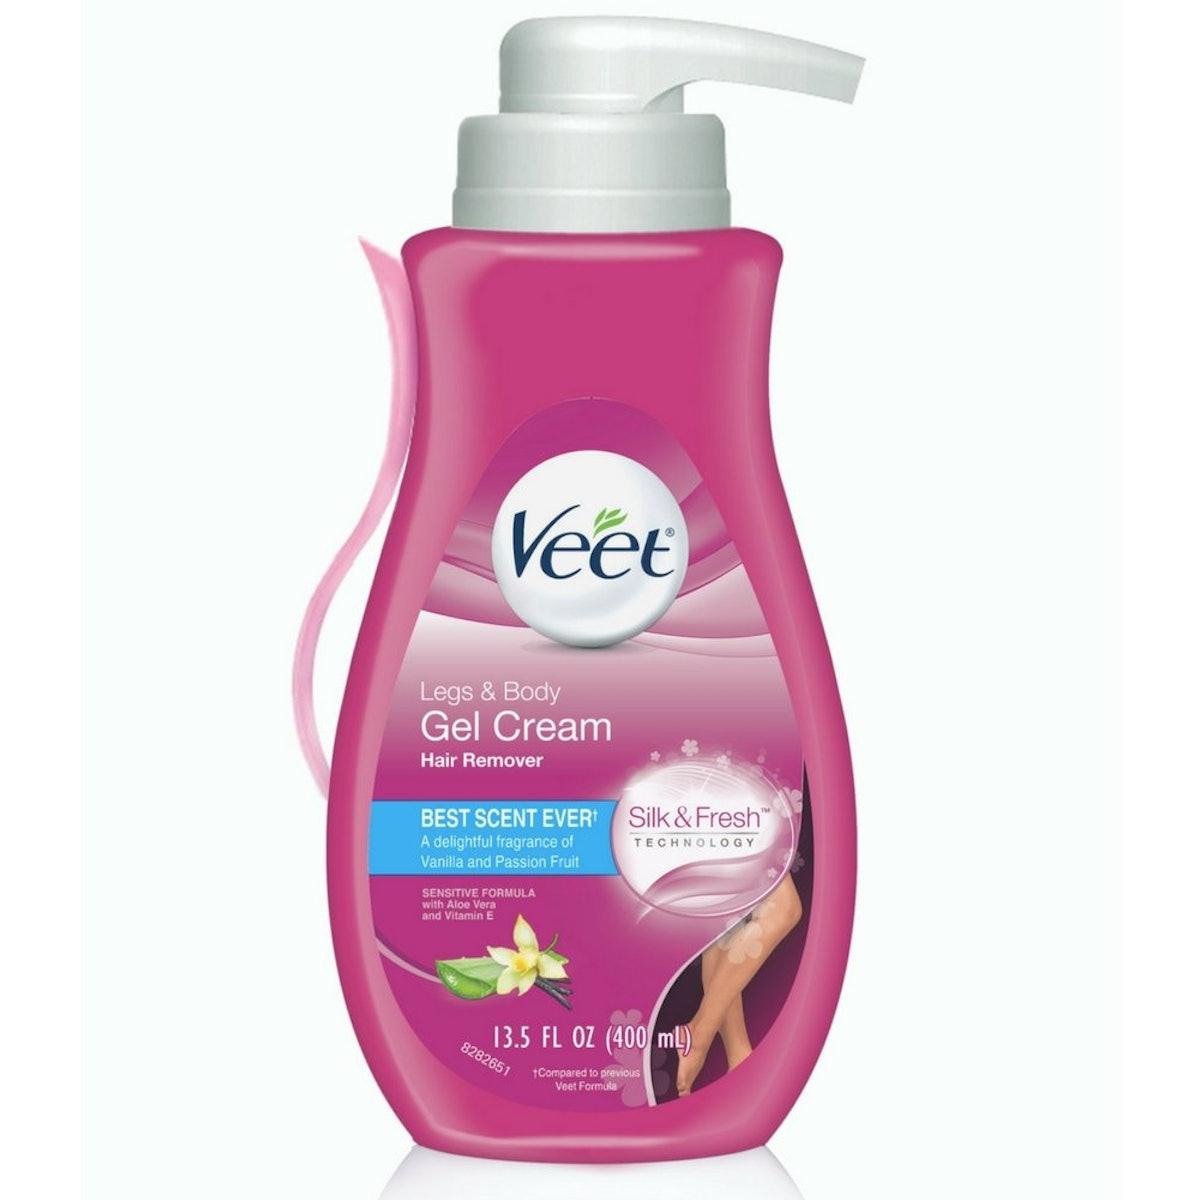 Veet Legs & Body Gel Cream Hair Remover